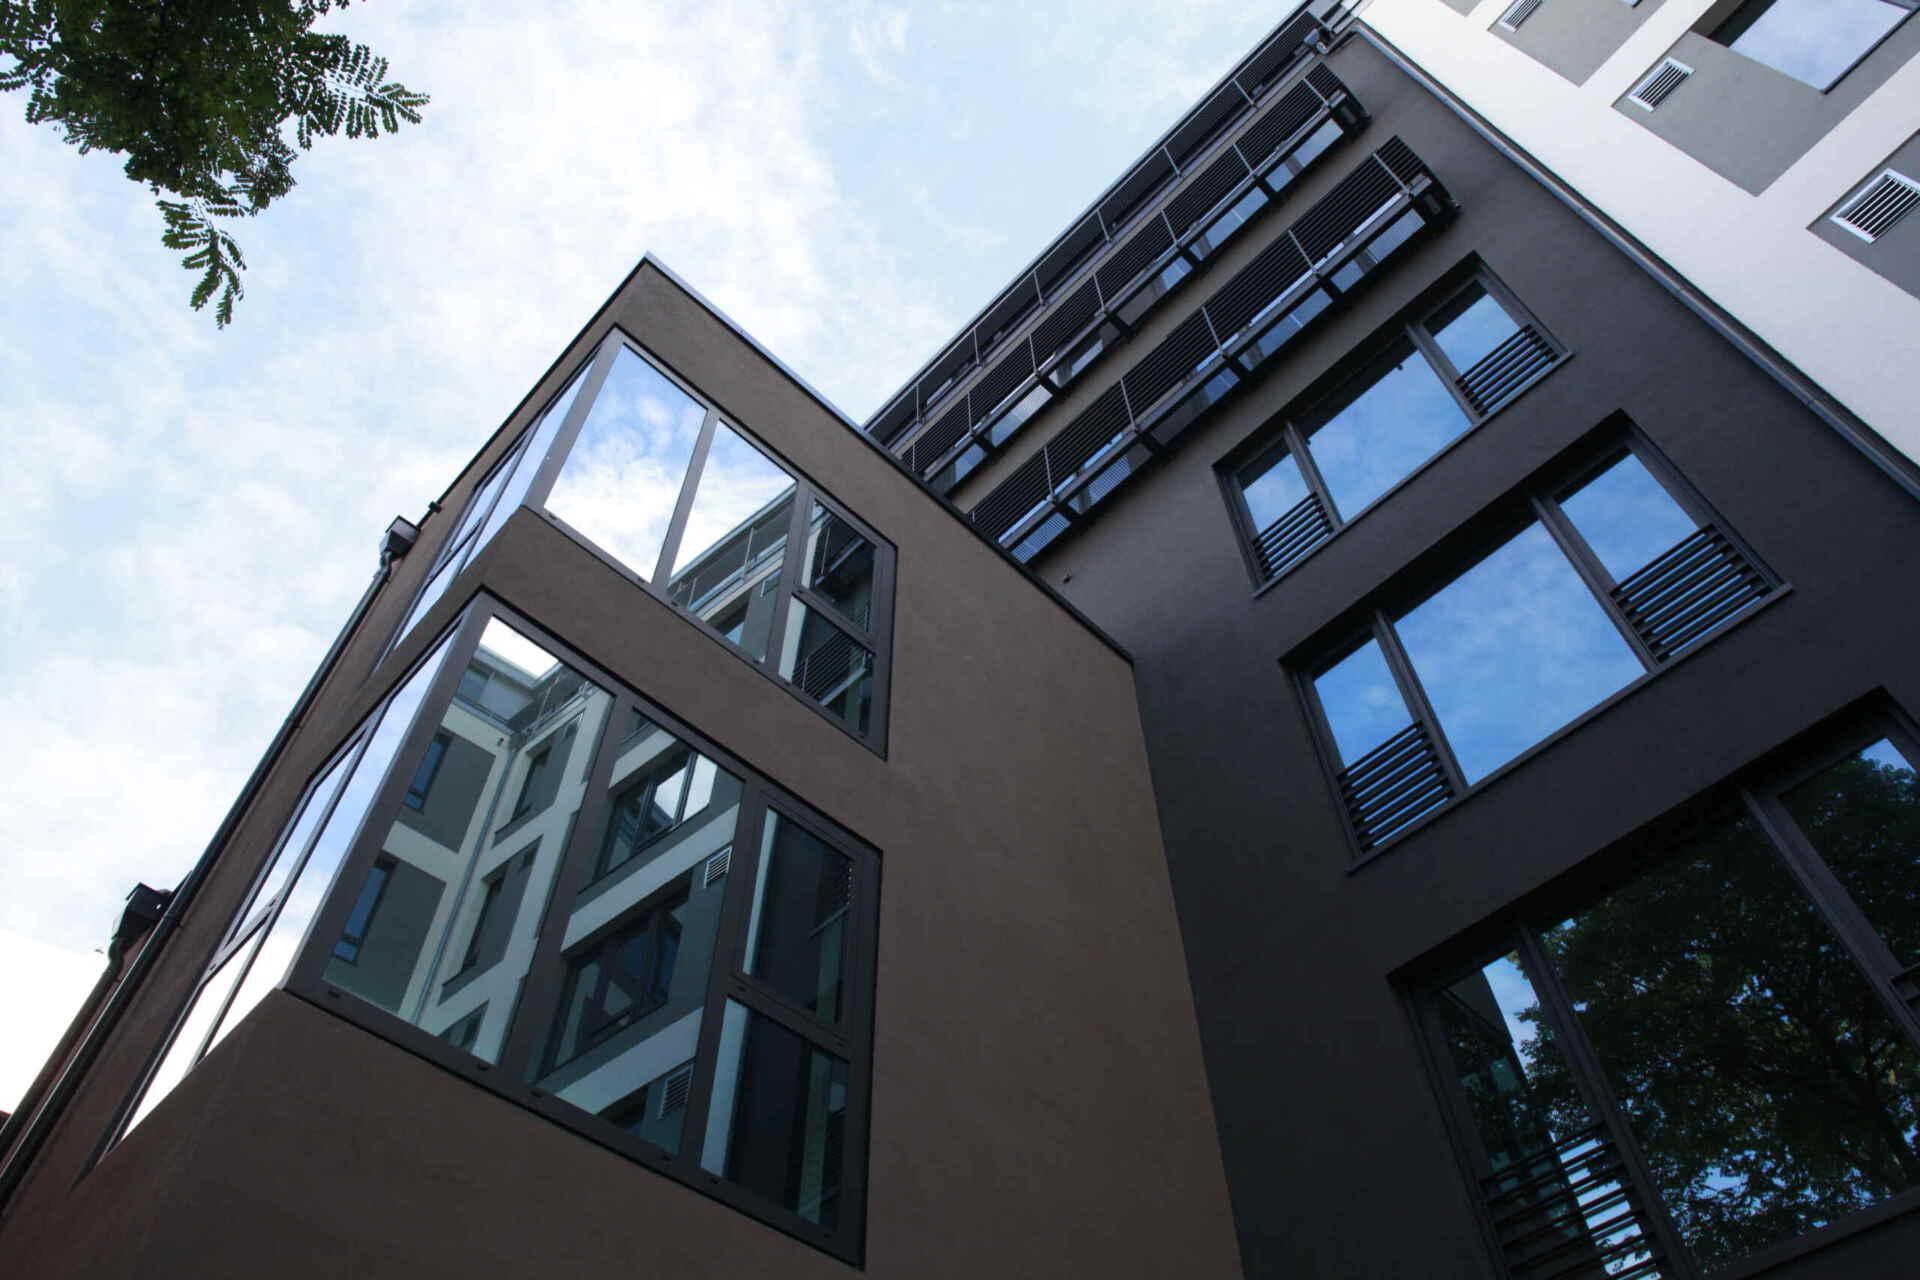 Lofthaus Budapester Strasse 47